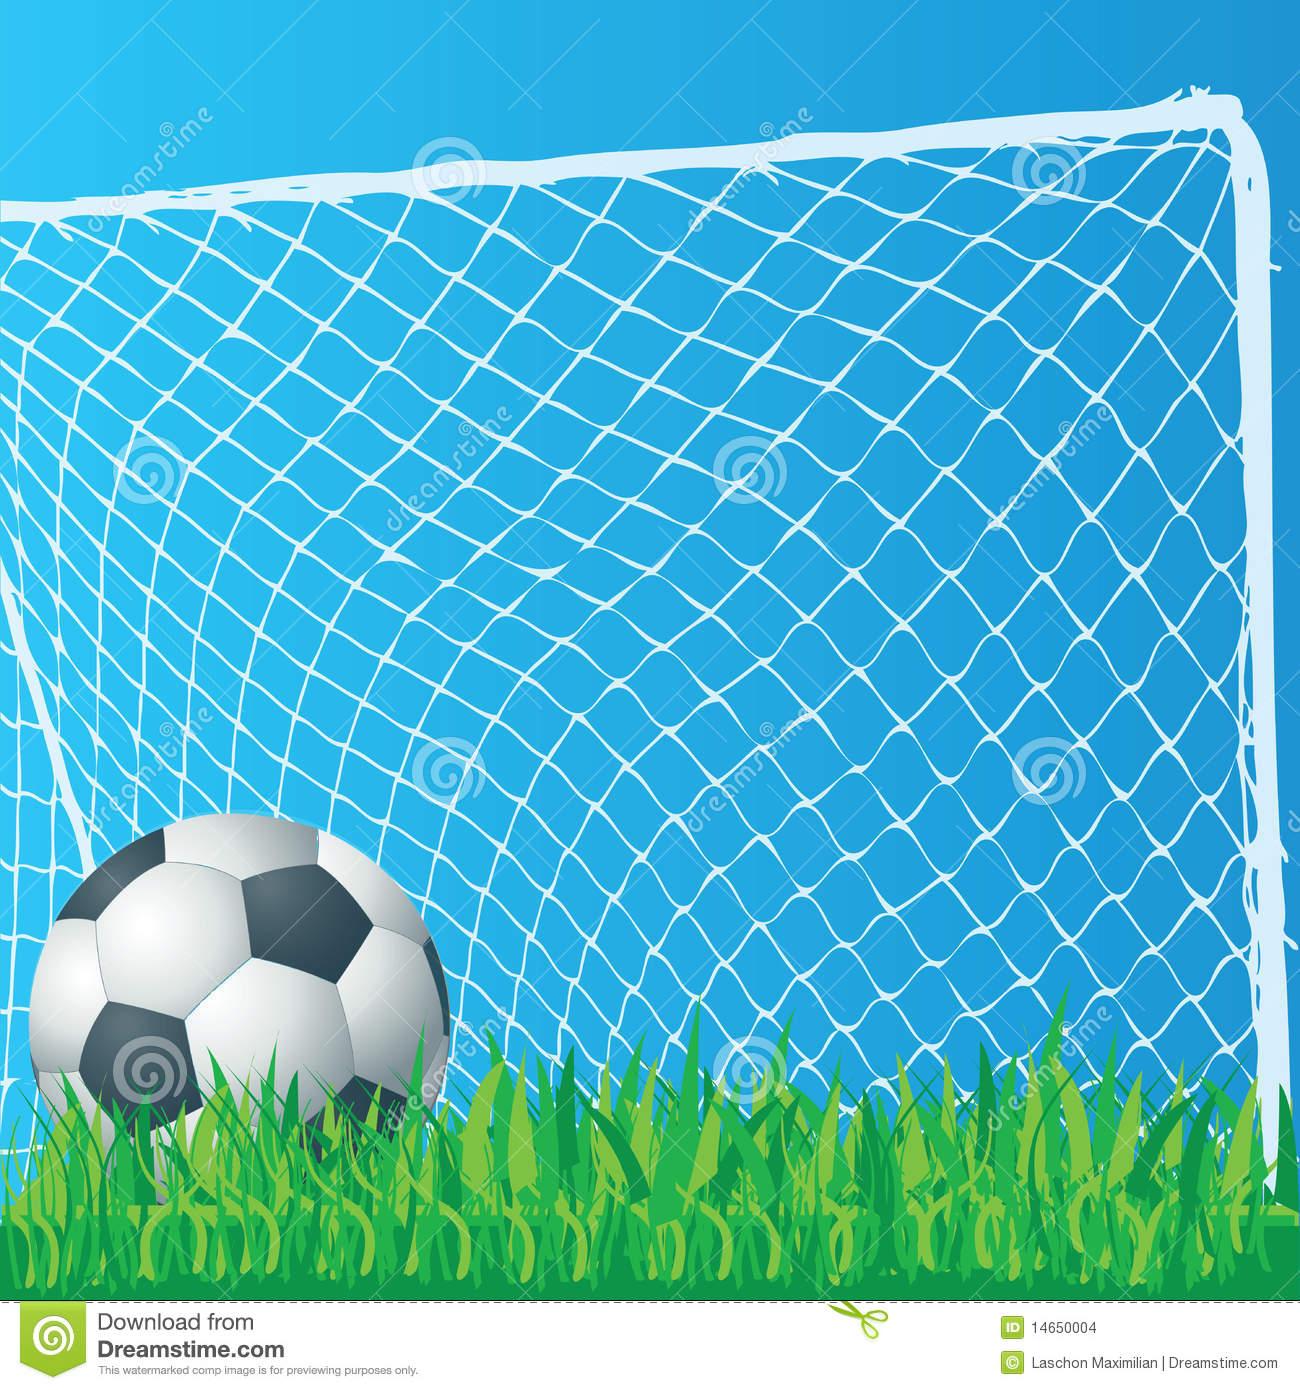 football net clipart - photo #1